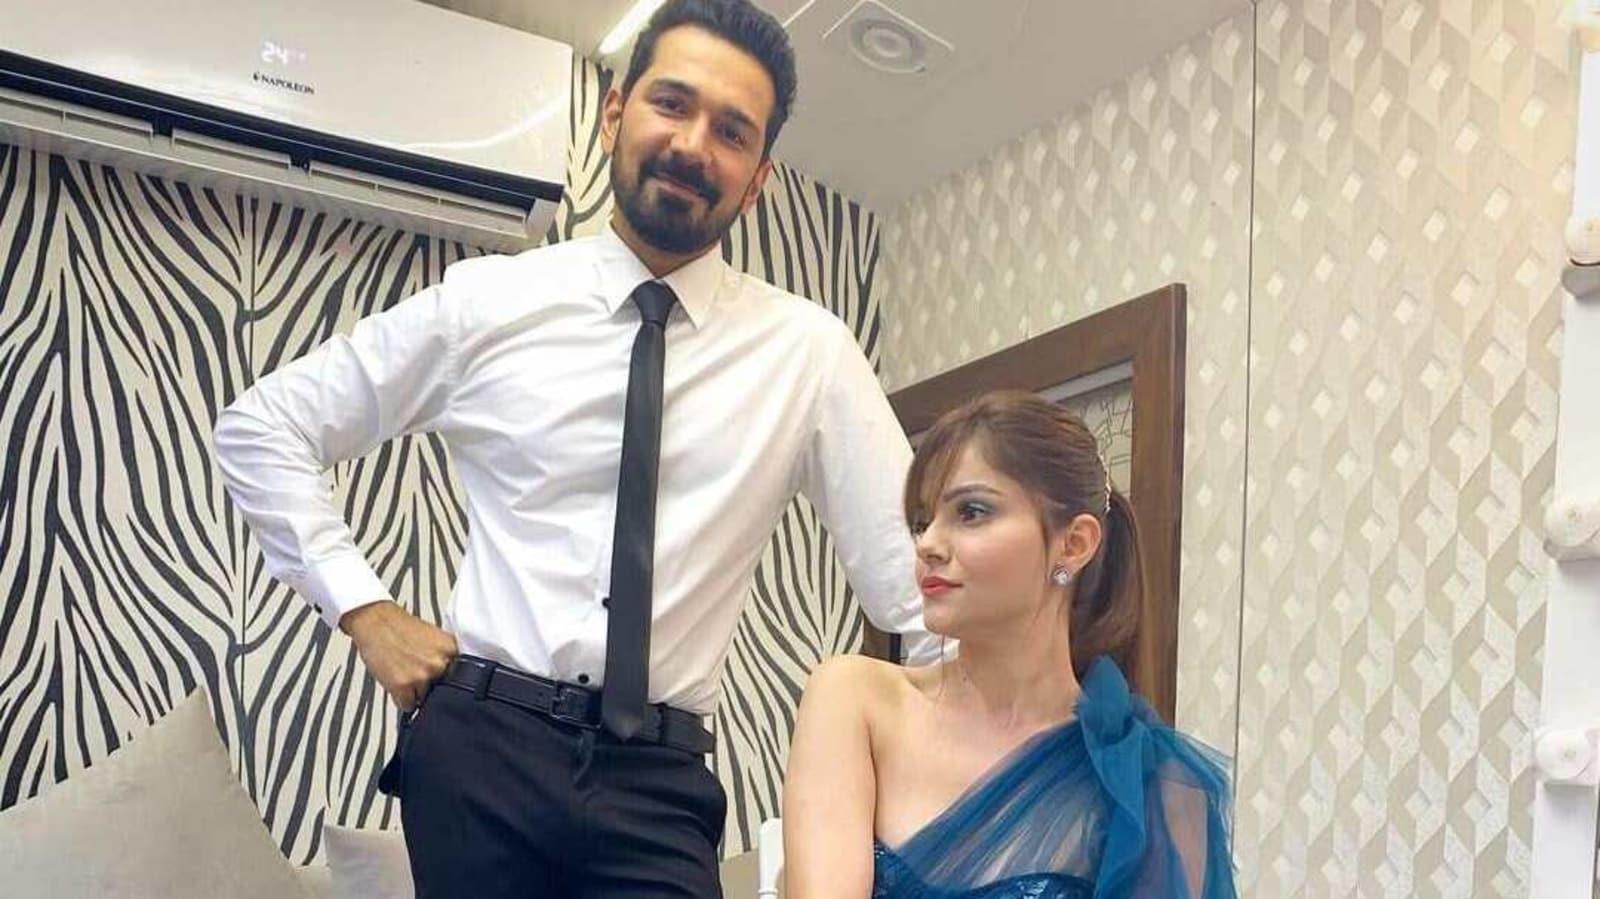 Bigg Boss 14 winner Rubina Dilaik wants nothing less than a destination wedding for second nuptials with Abhinav Shukla